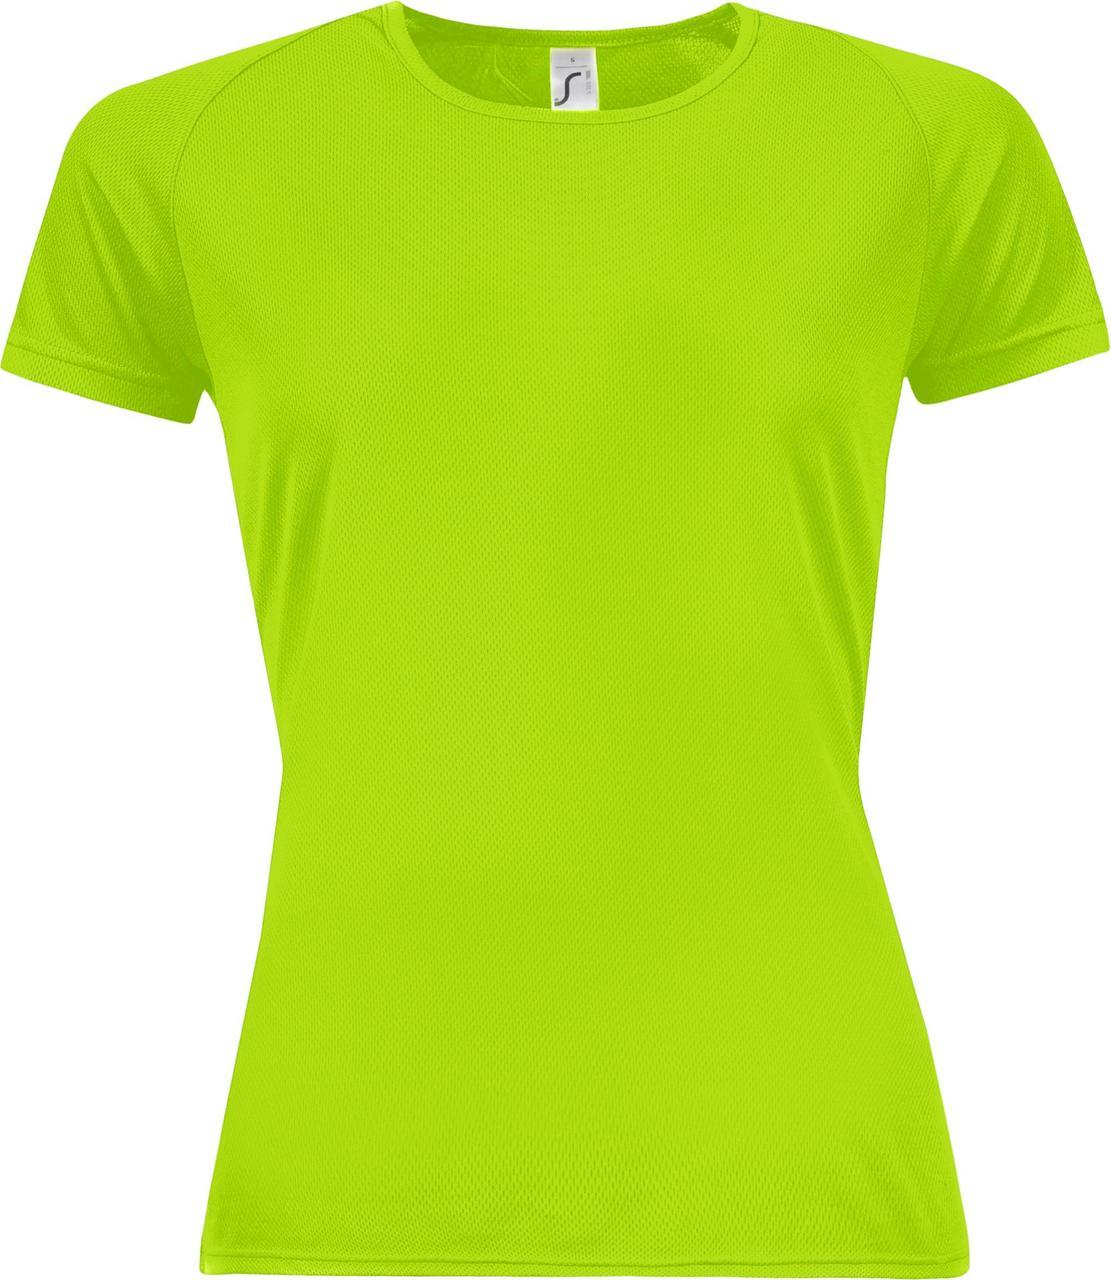 Футболка женская Sporty Women 140, зеленый неон (артикул 01159286)